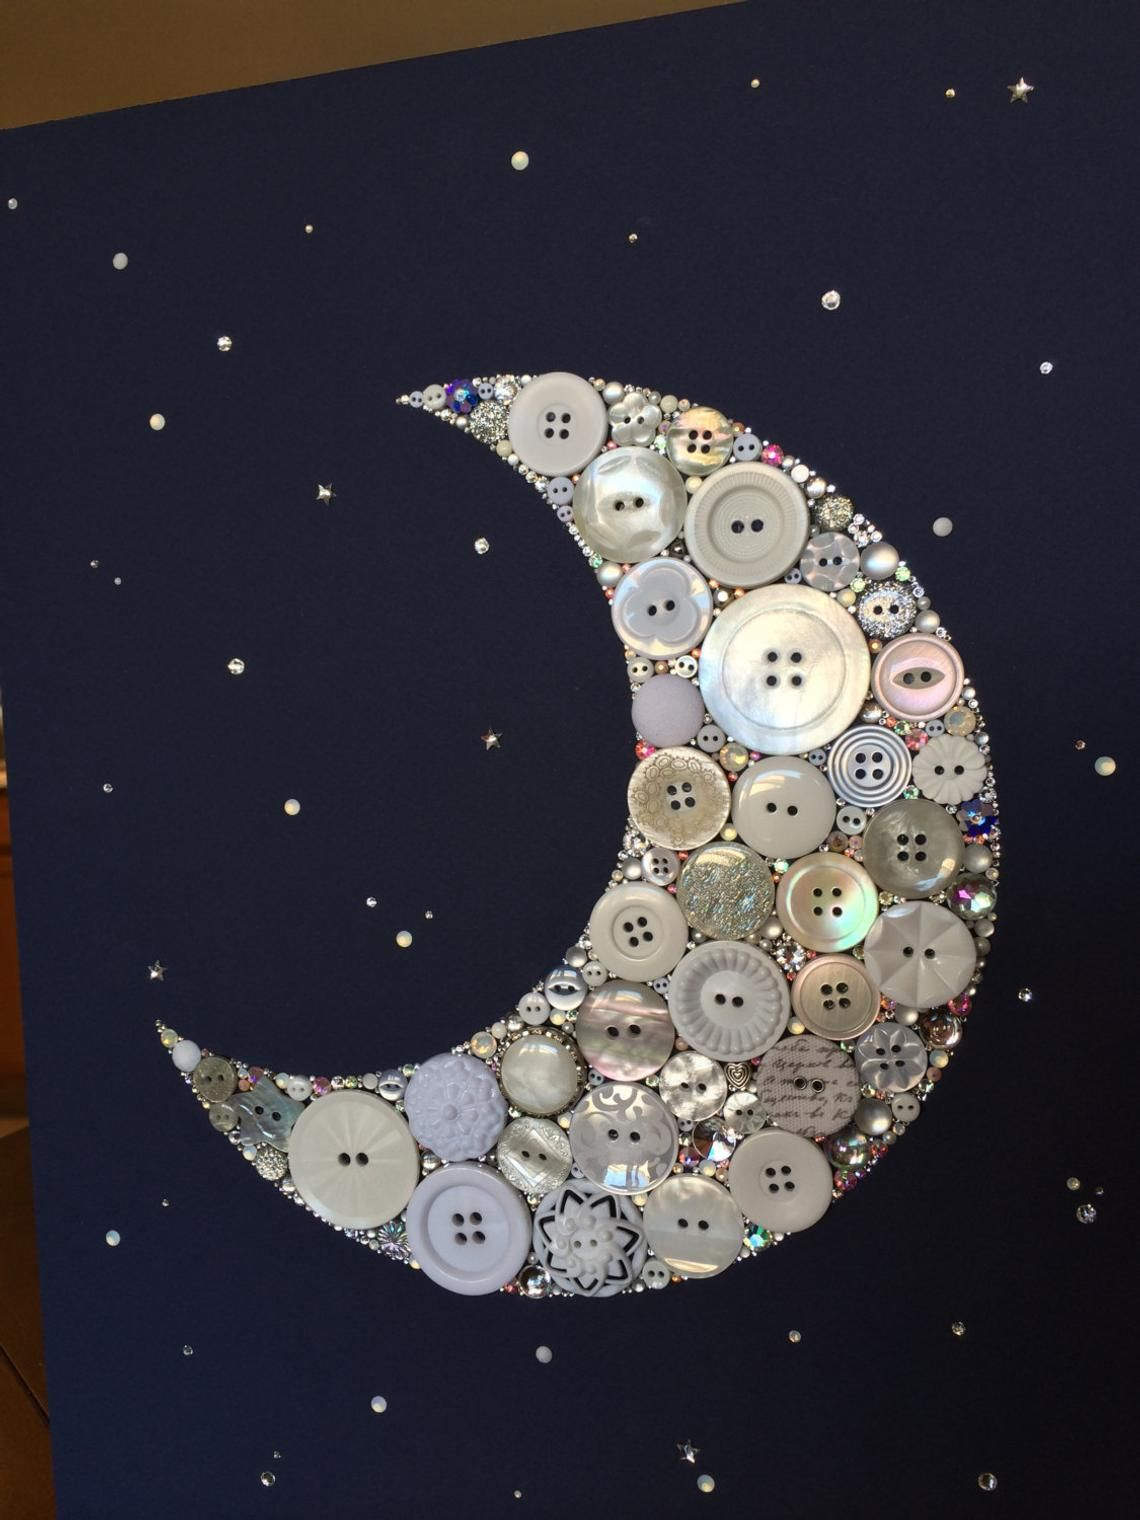 Moon Wall Art Crescent Decoration